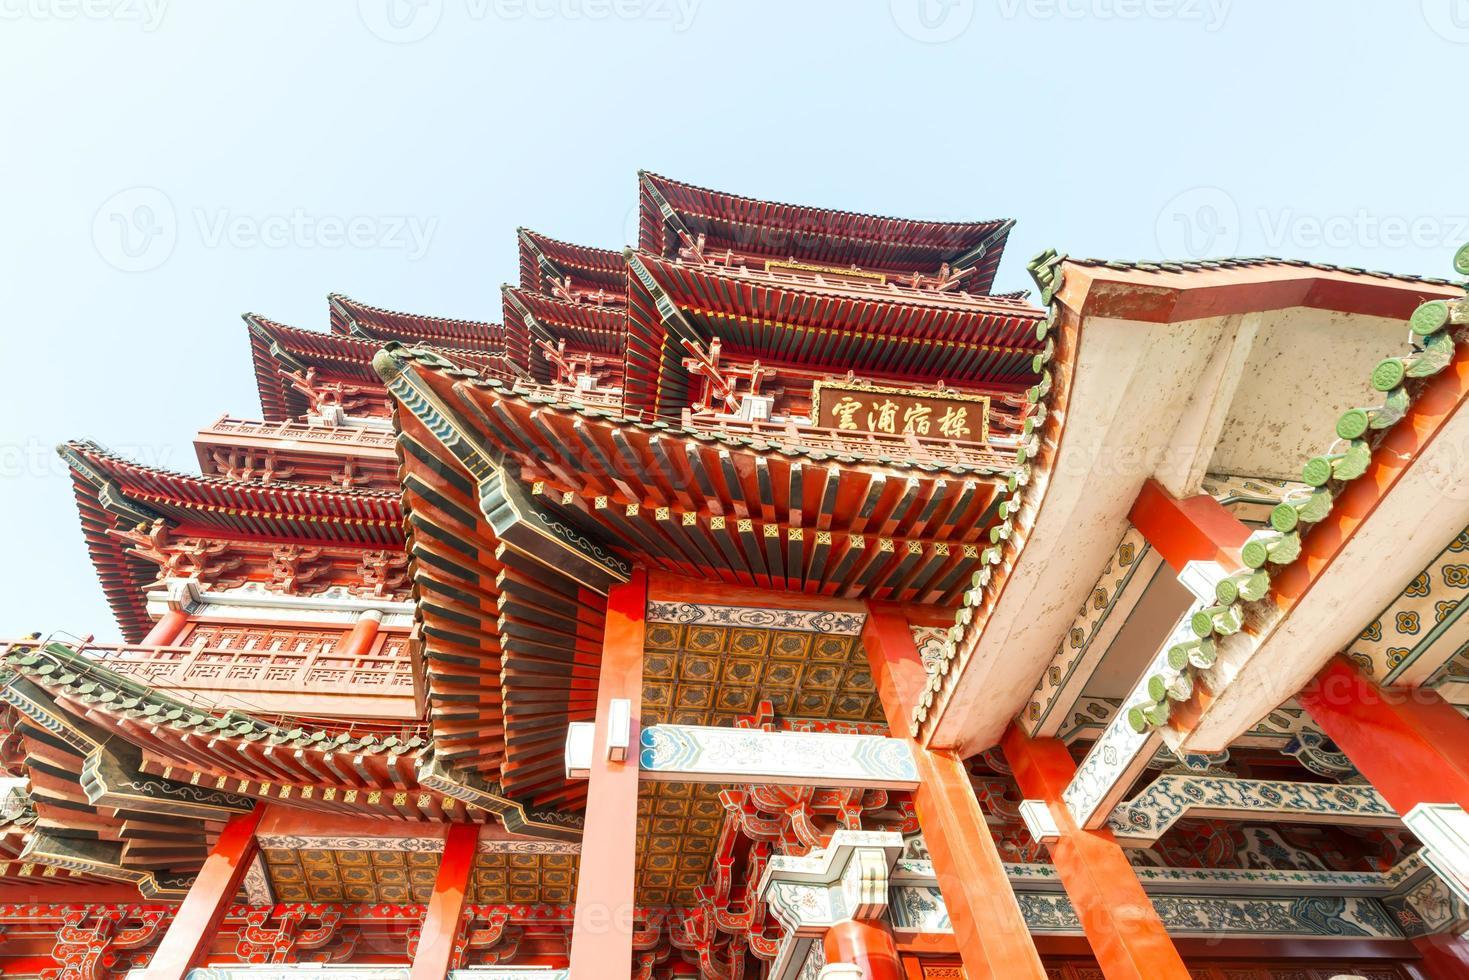 pavilhão de tengwang, nanchang, t radicional, arquita chinesa antiga foto